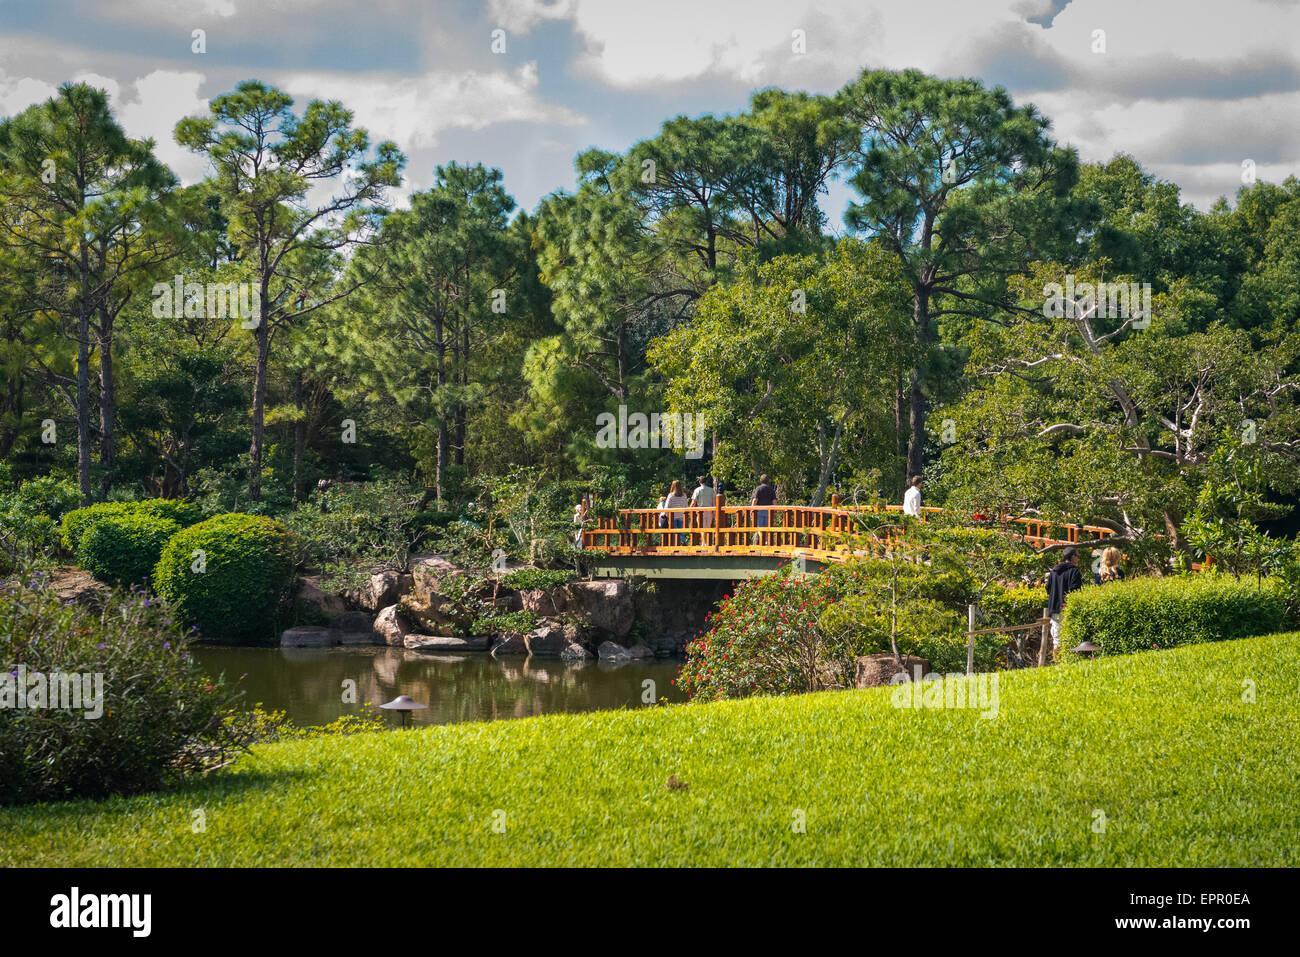 Florida Del Ray Beach Morikami Museum Park Roji En Japanese Gardens Stock Photo Royalty Free